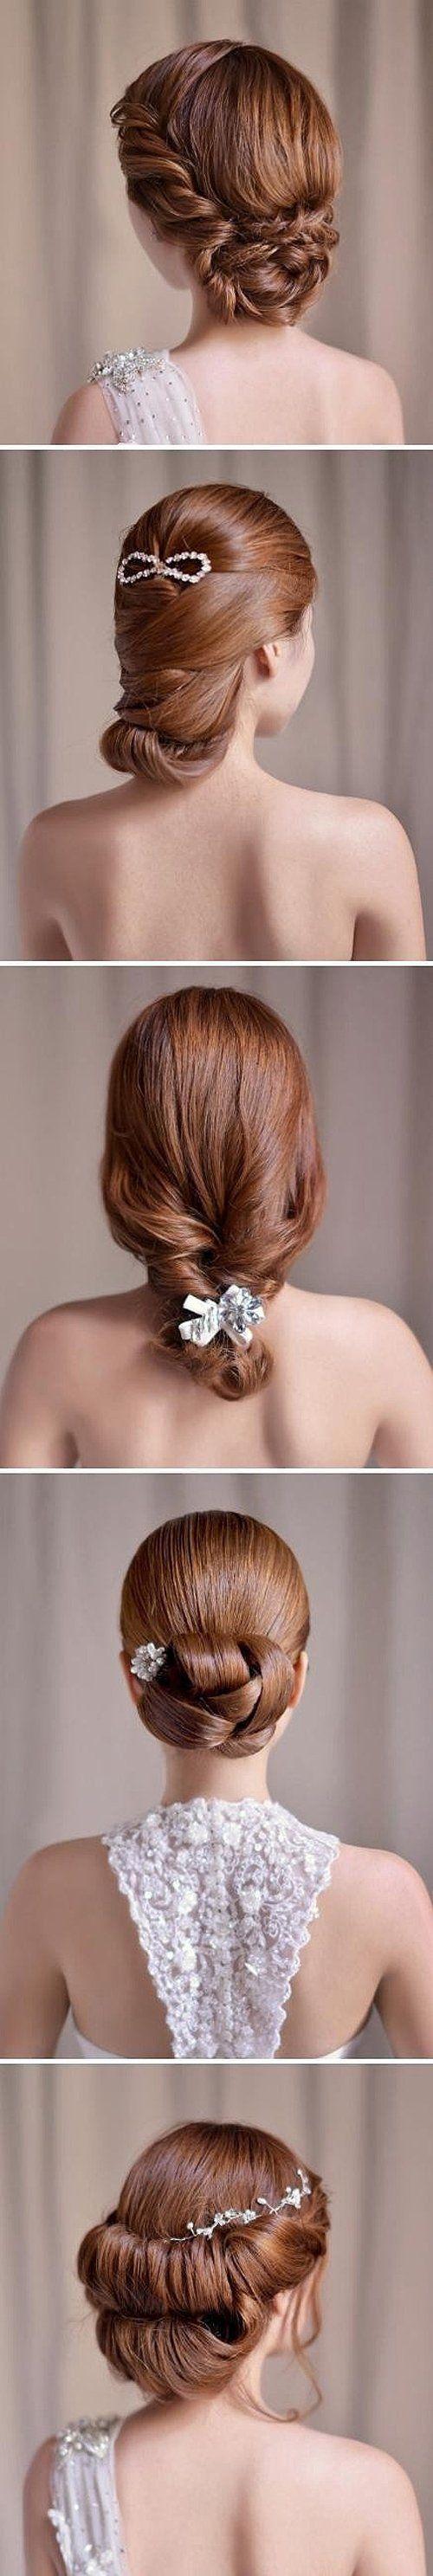 Penteados para casamento. #penteado #penteadopreso #penteadoelegante